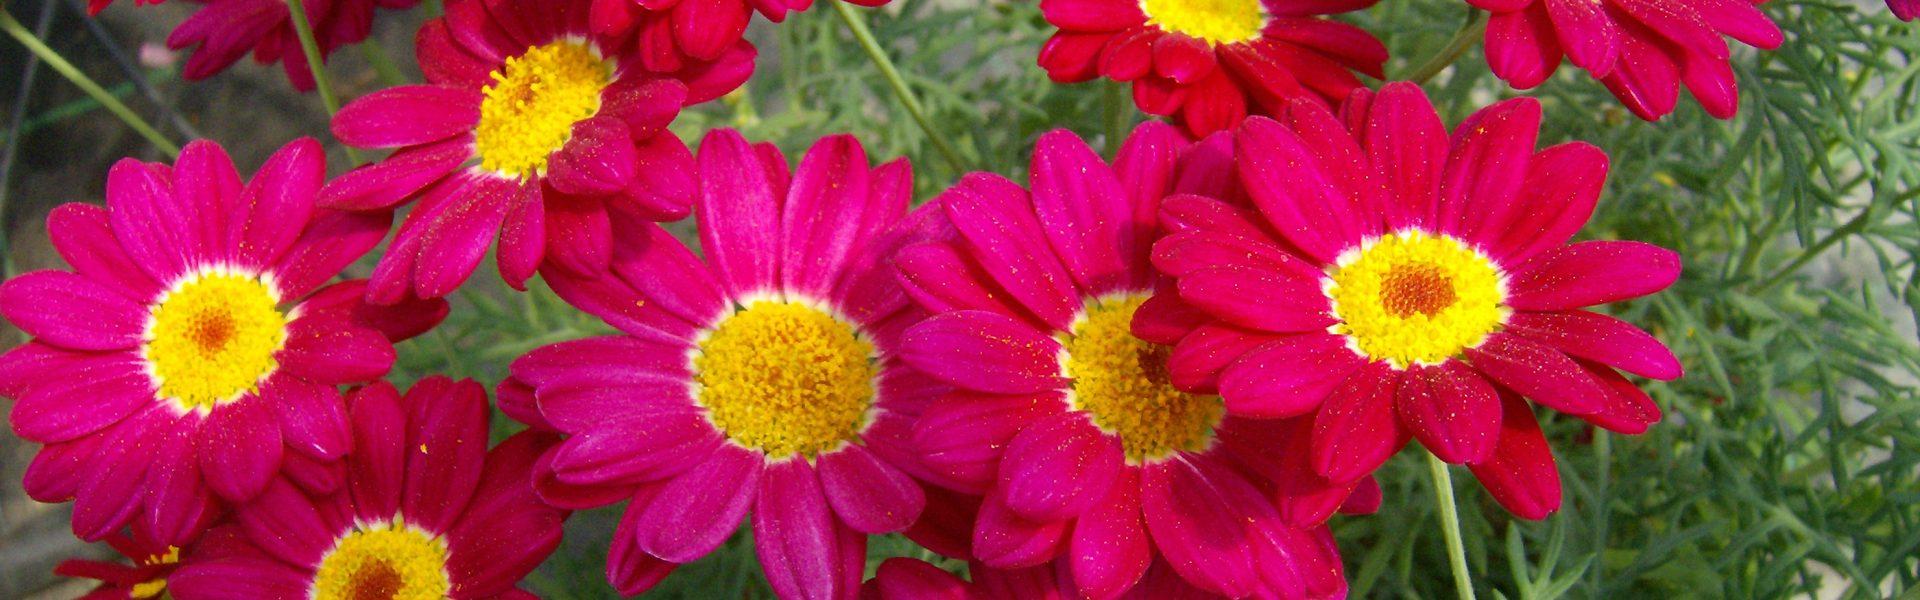 Margeritt i farger